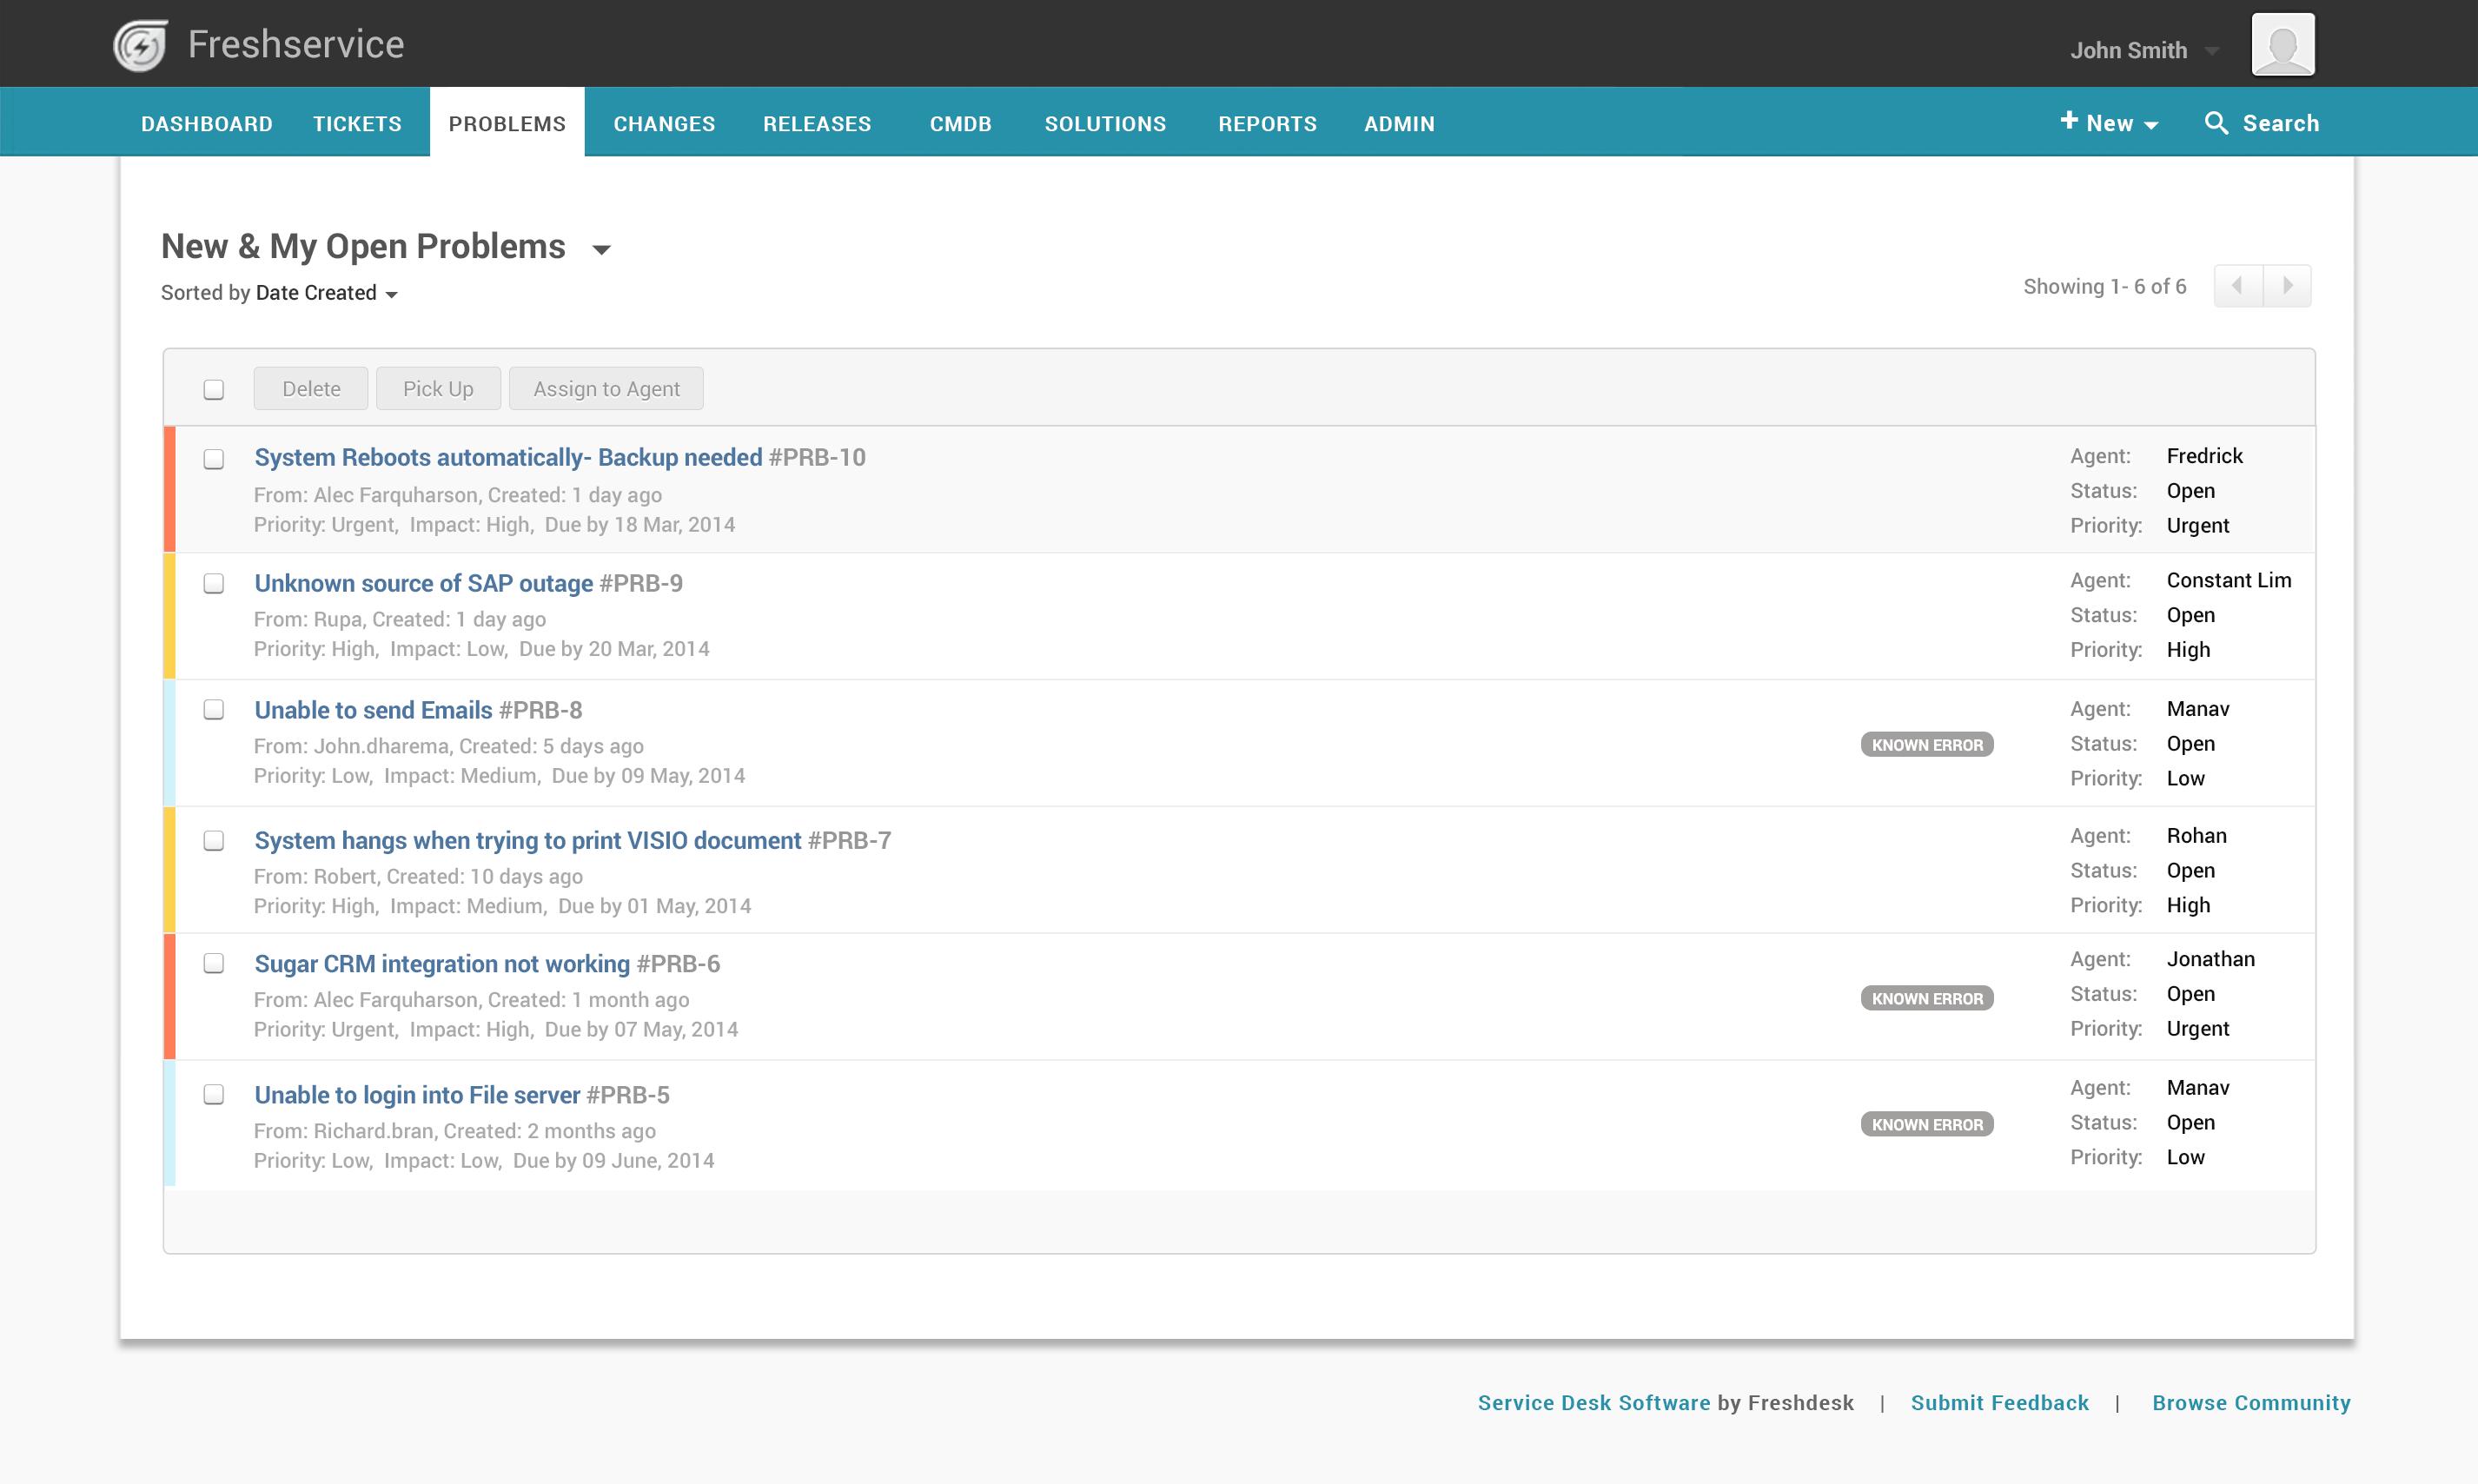 Freshservice Software - Freshservice problem management